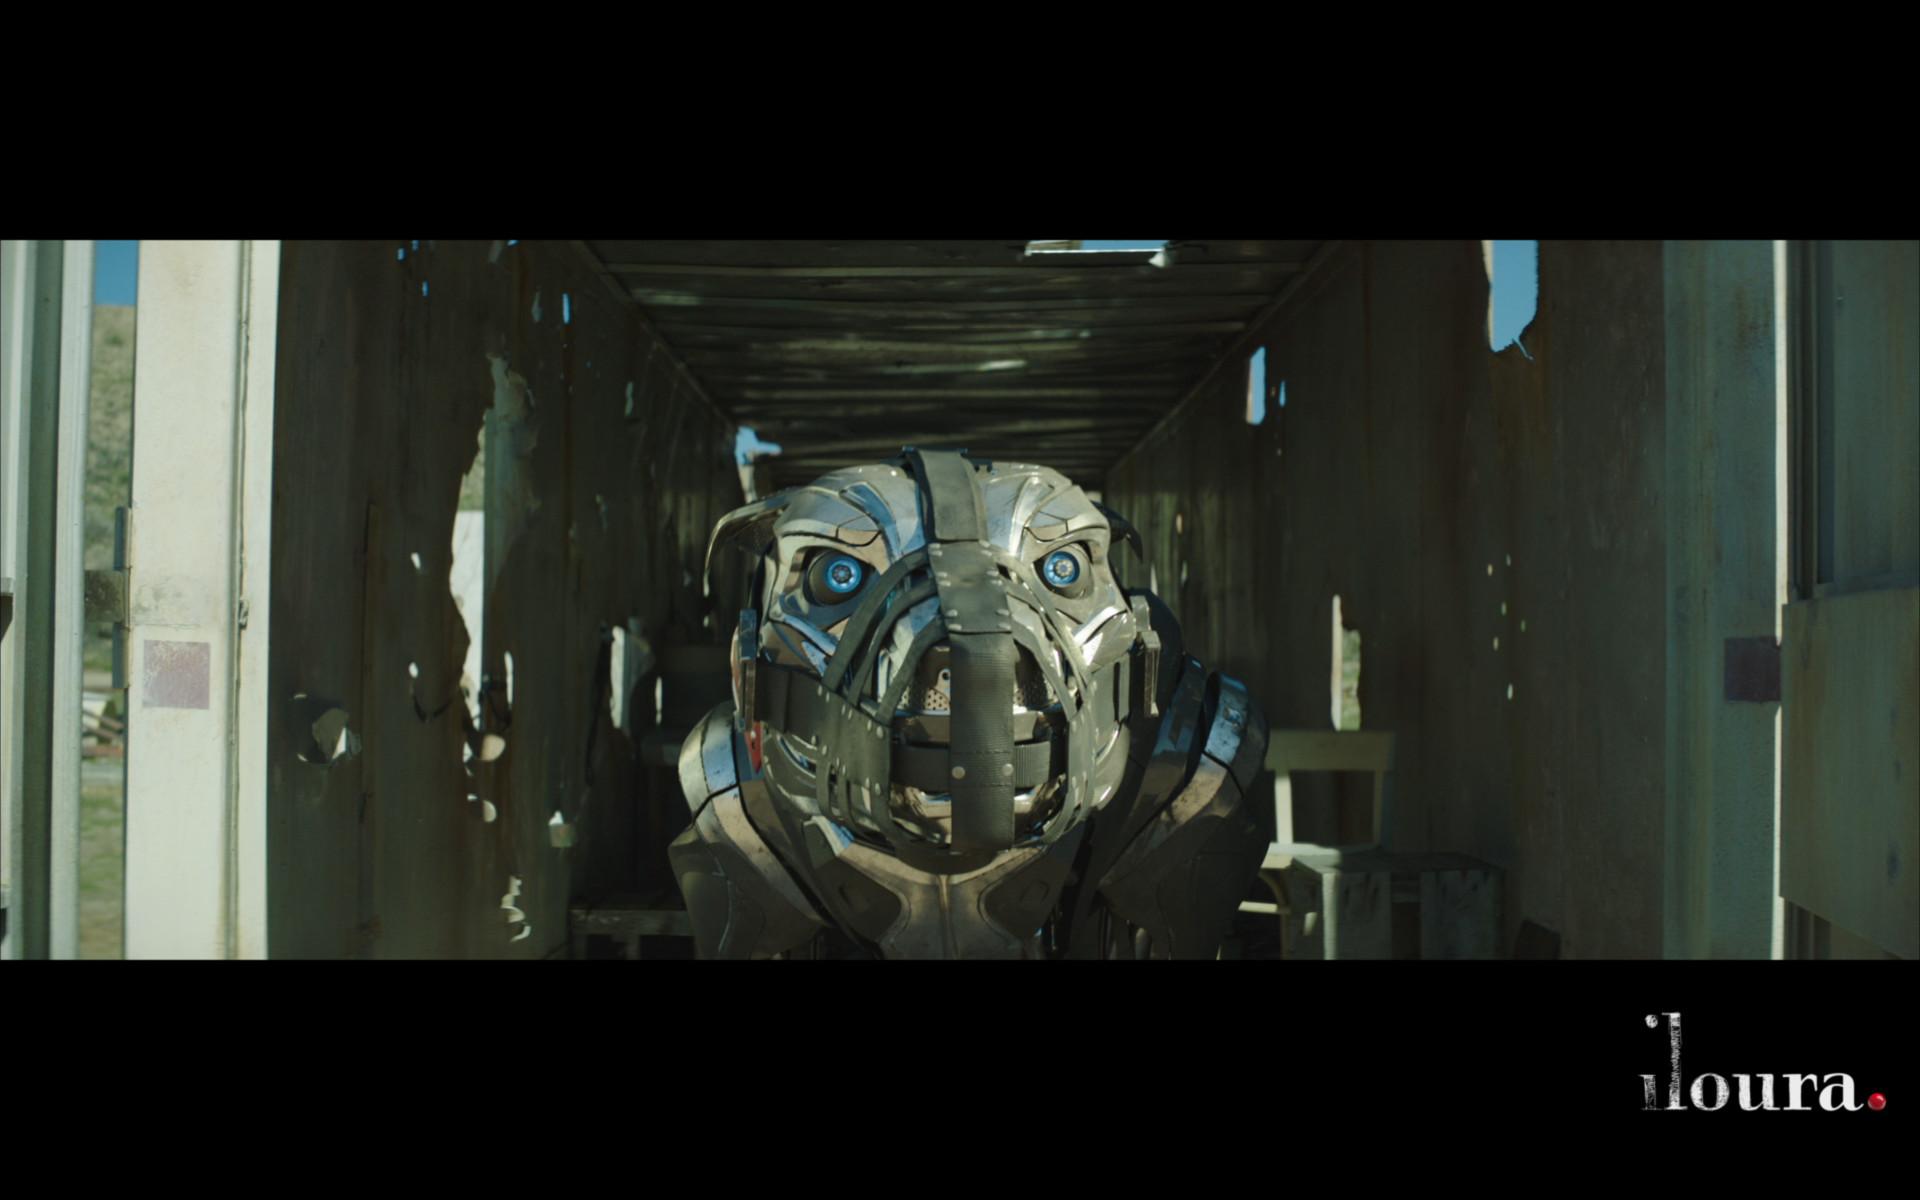 Axl Movie 2018 artstation - a.x.l. - substance painter, ray leung